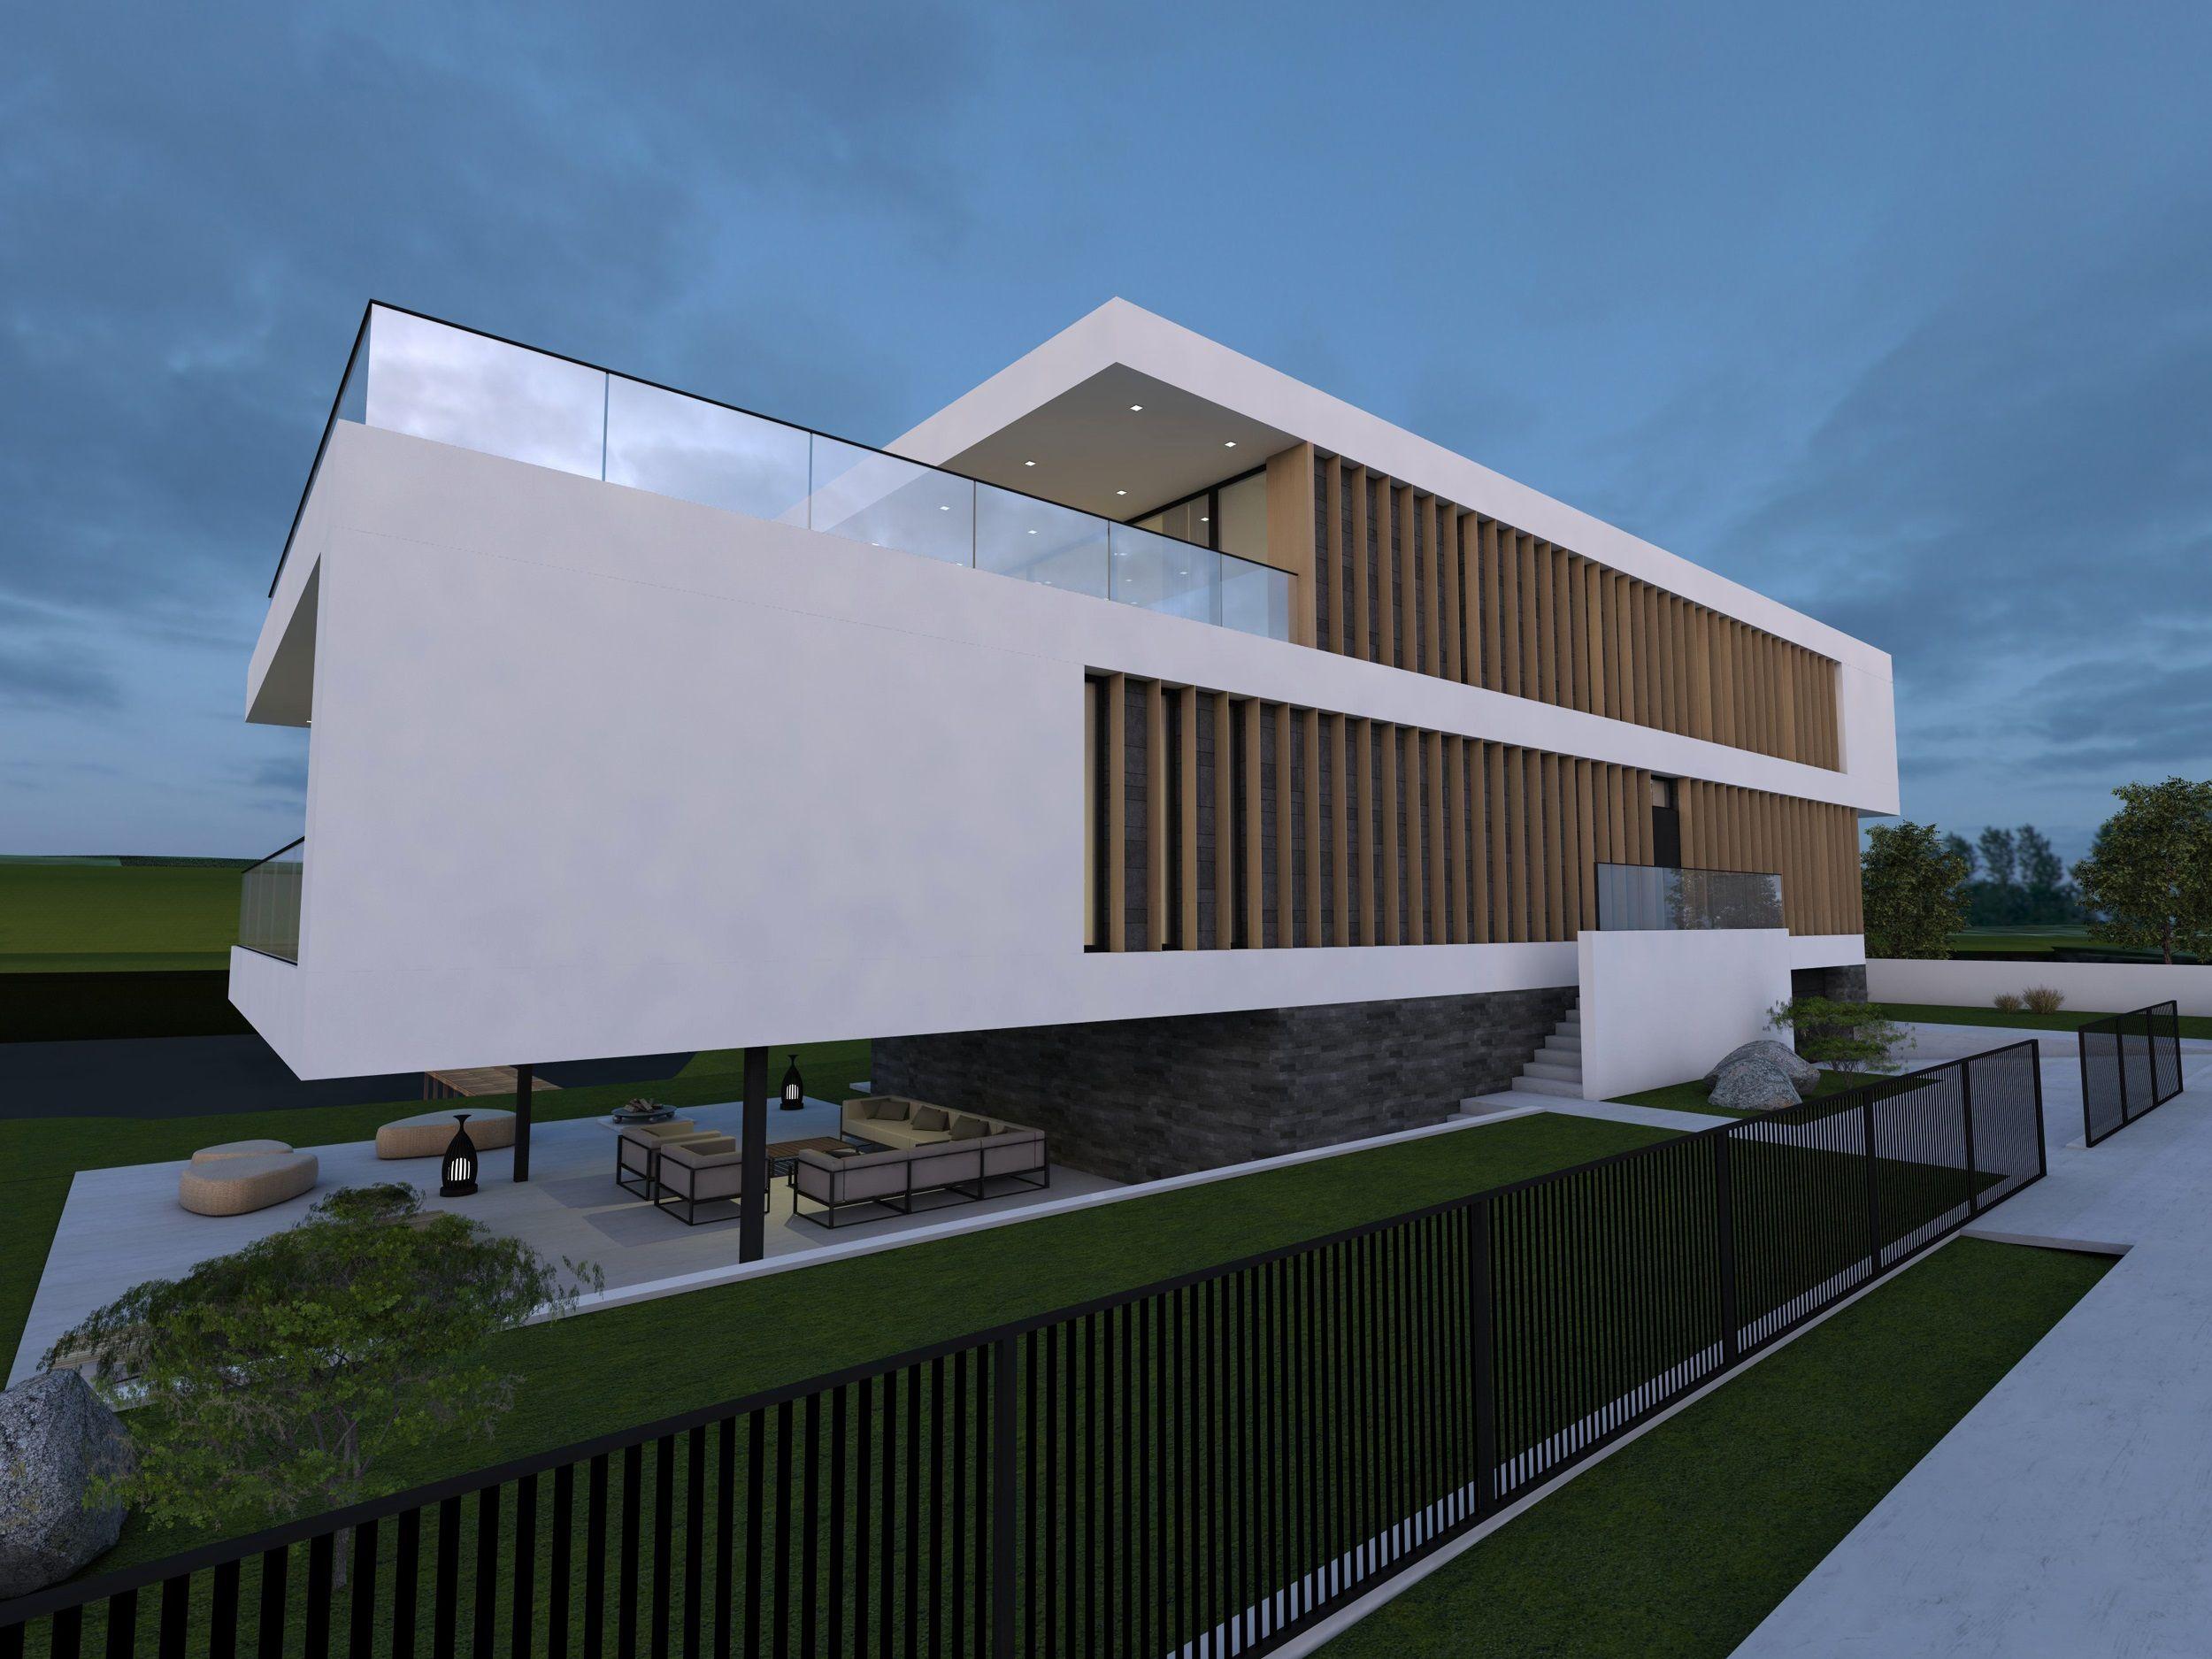 Modern Houses 에 있는 핀